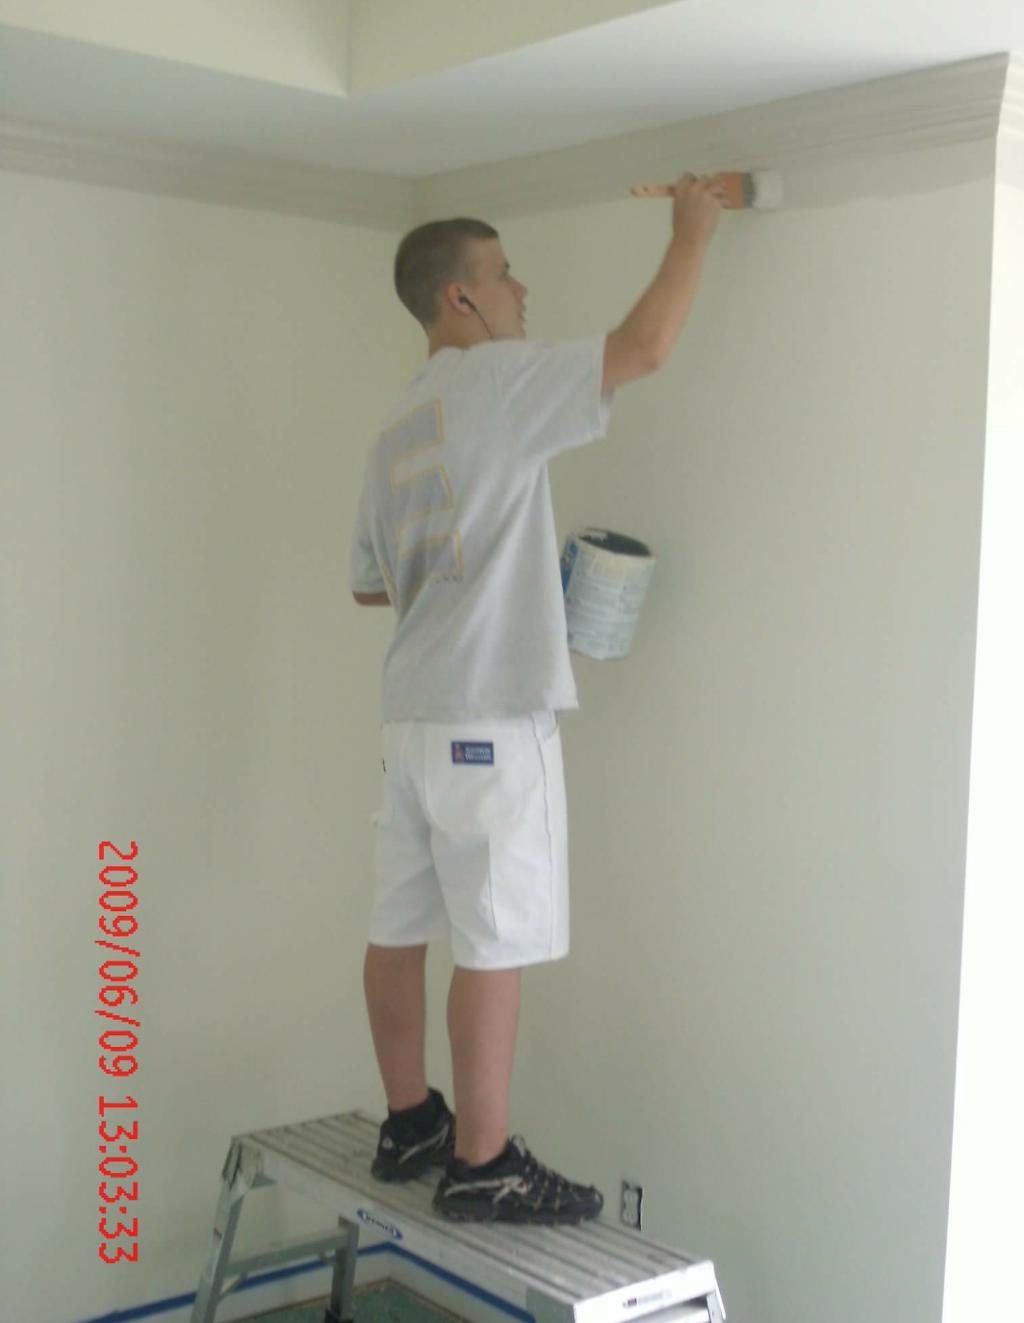 Veterans Pro Painters - painter  | Photo 4 of 10 | Address: 503 E Newport Rd, Lititz, PA 17543, USA | Phone: (717) 740-1000